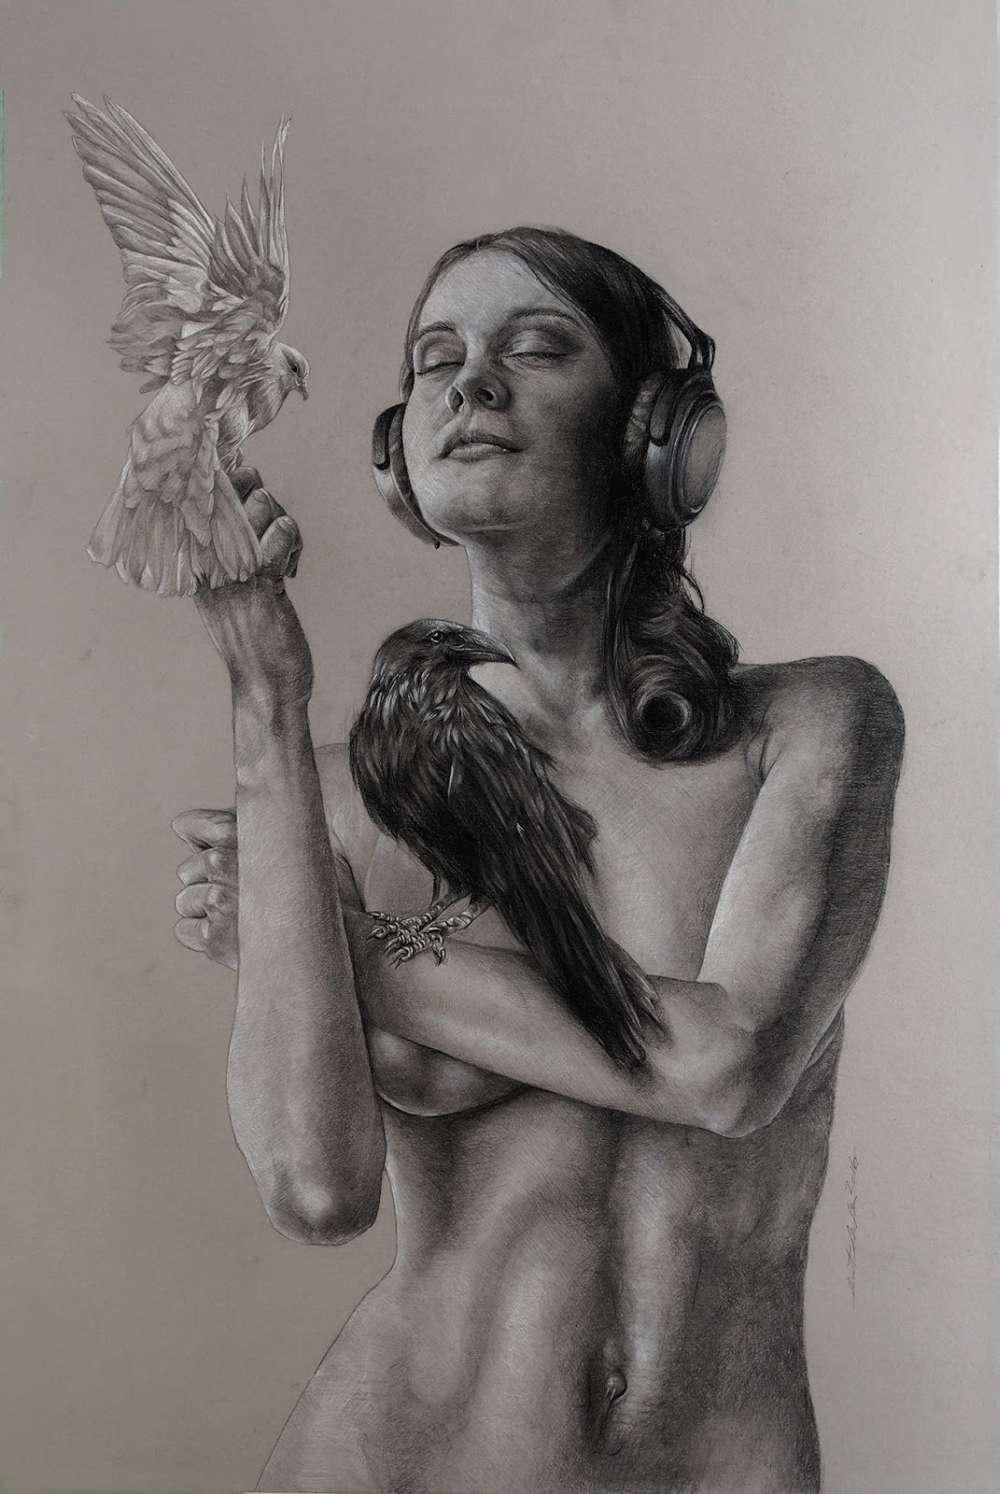 Brent Schreiber Paintings Drawings_Listen_154485